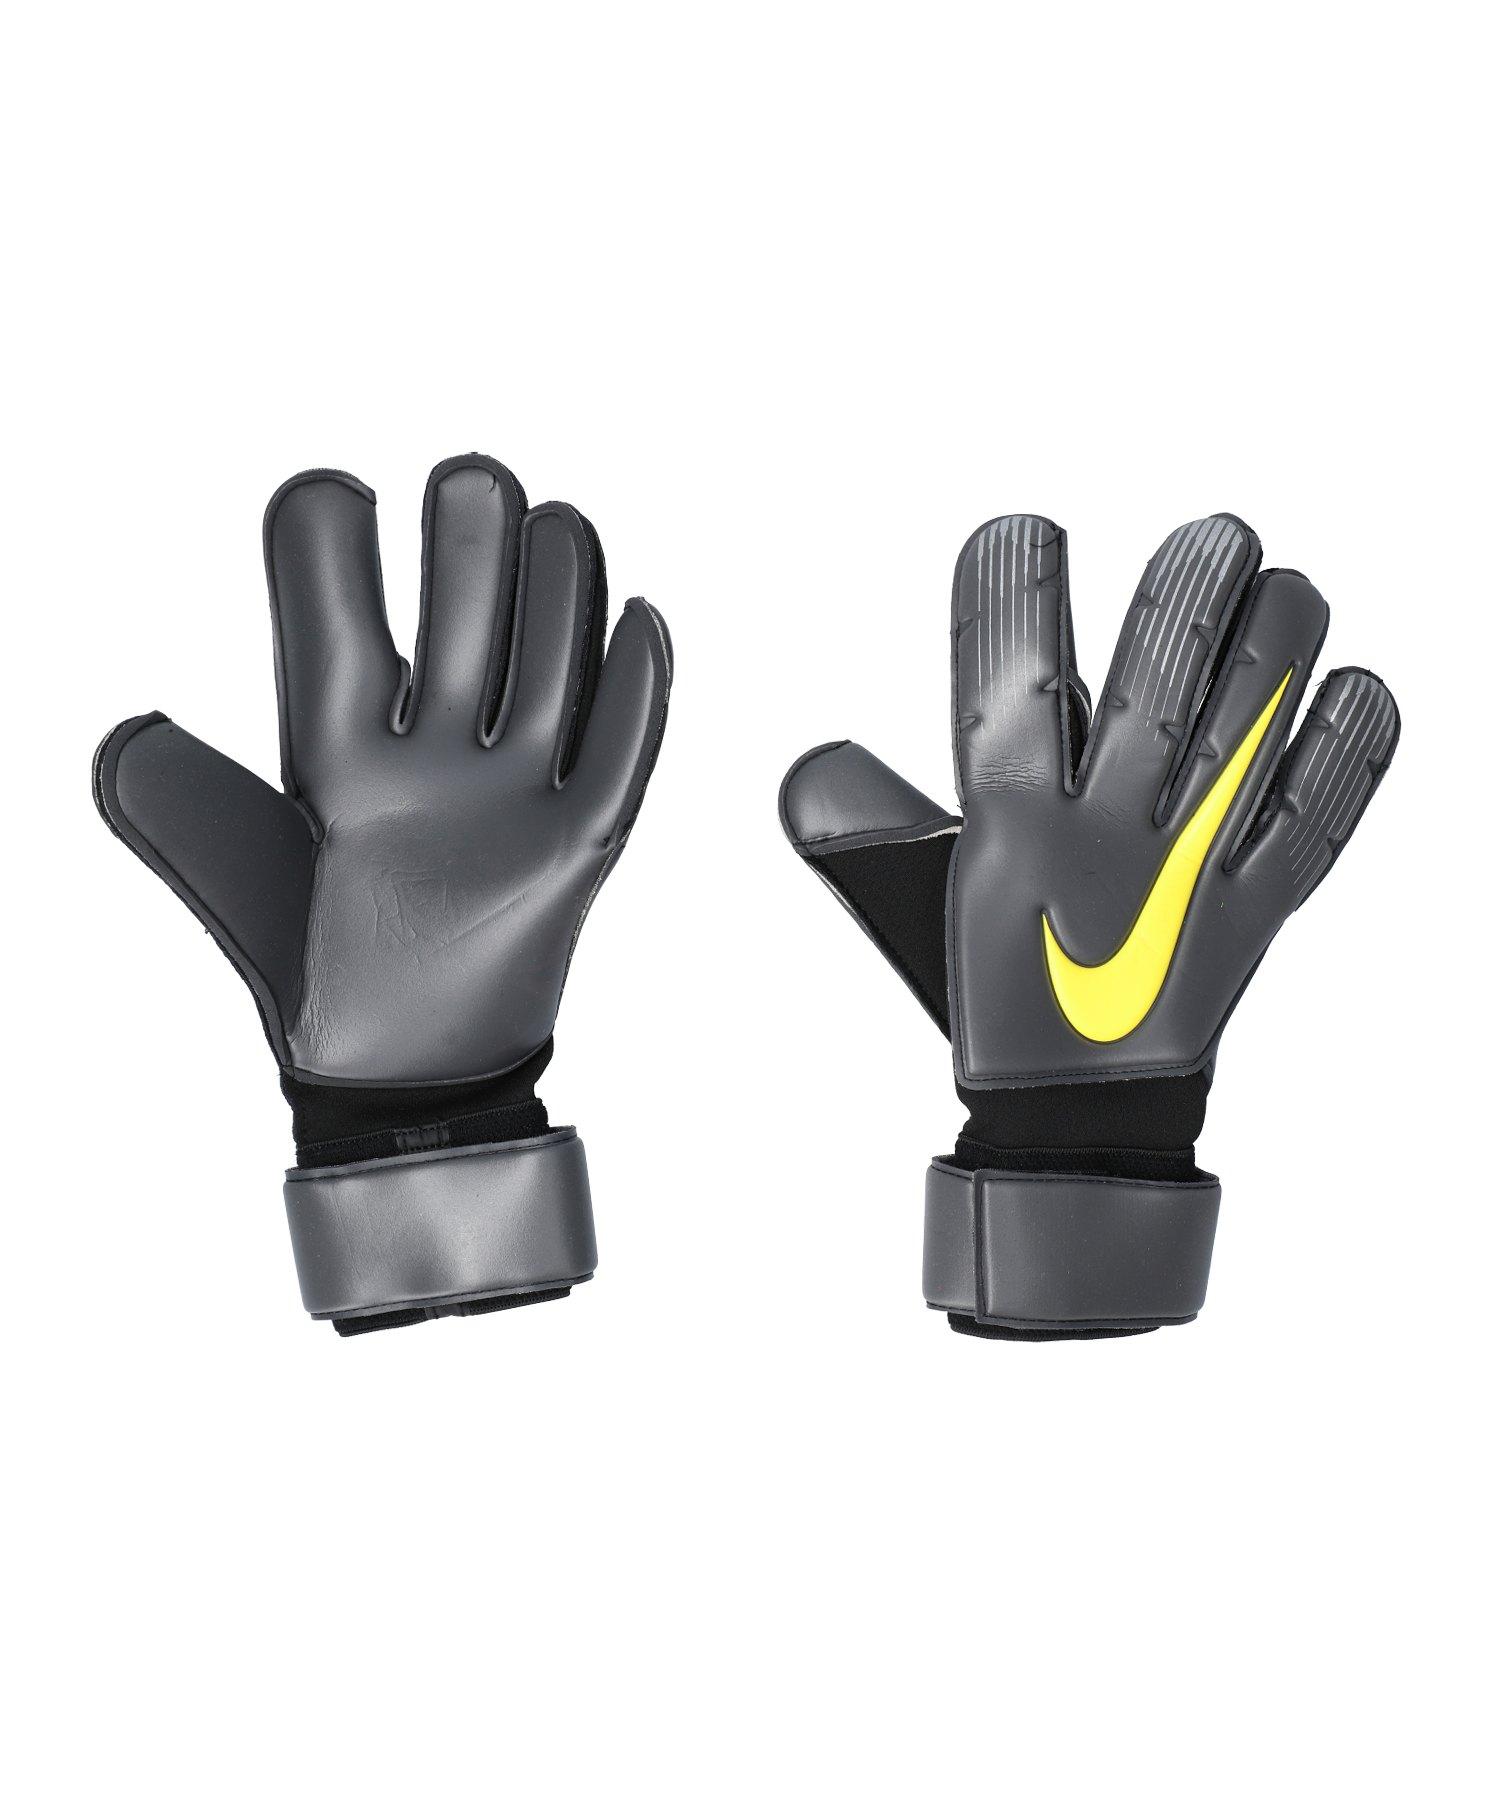 Nike Vapor Grip 3 Promo TW-Handschuhe Grau F060 - grau